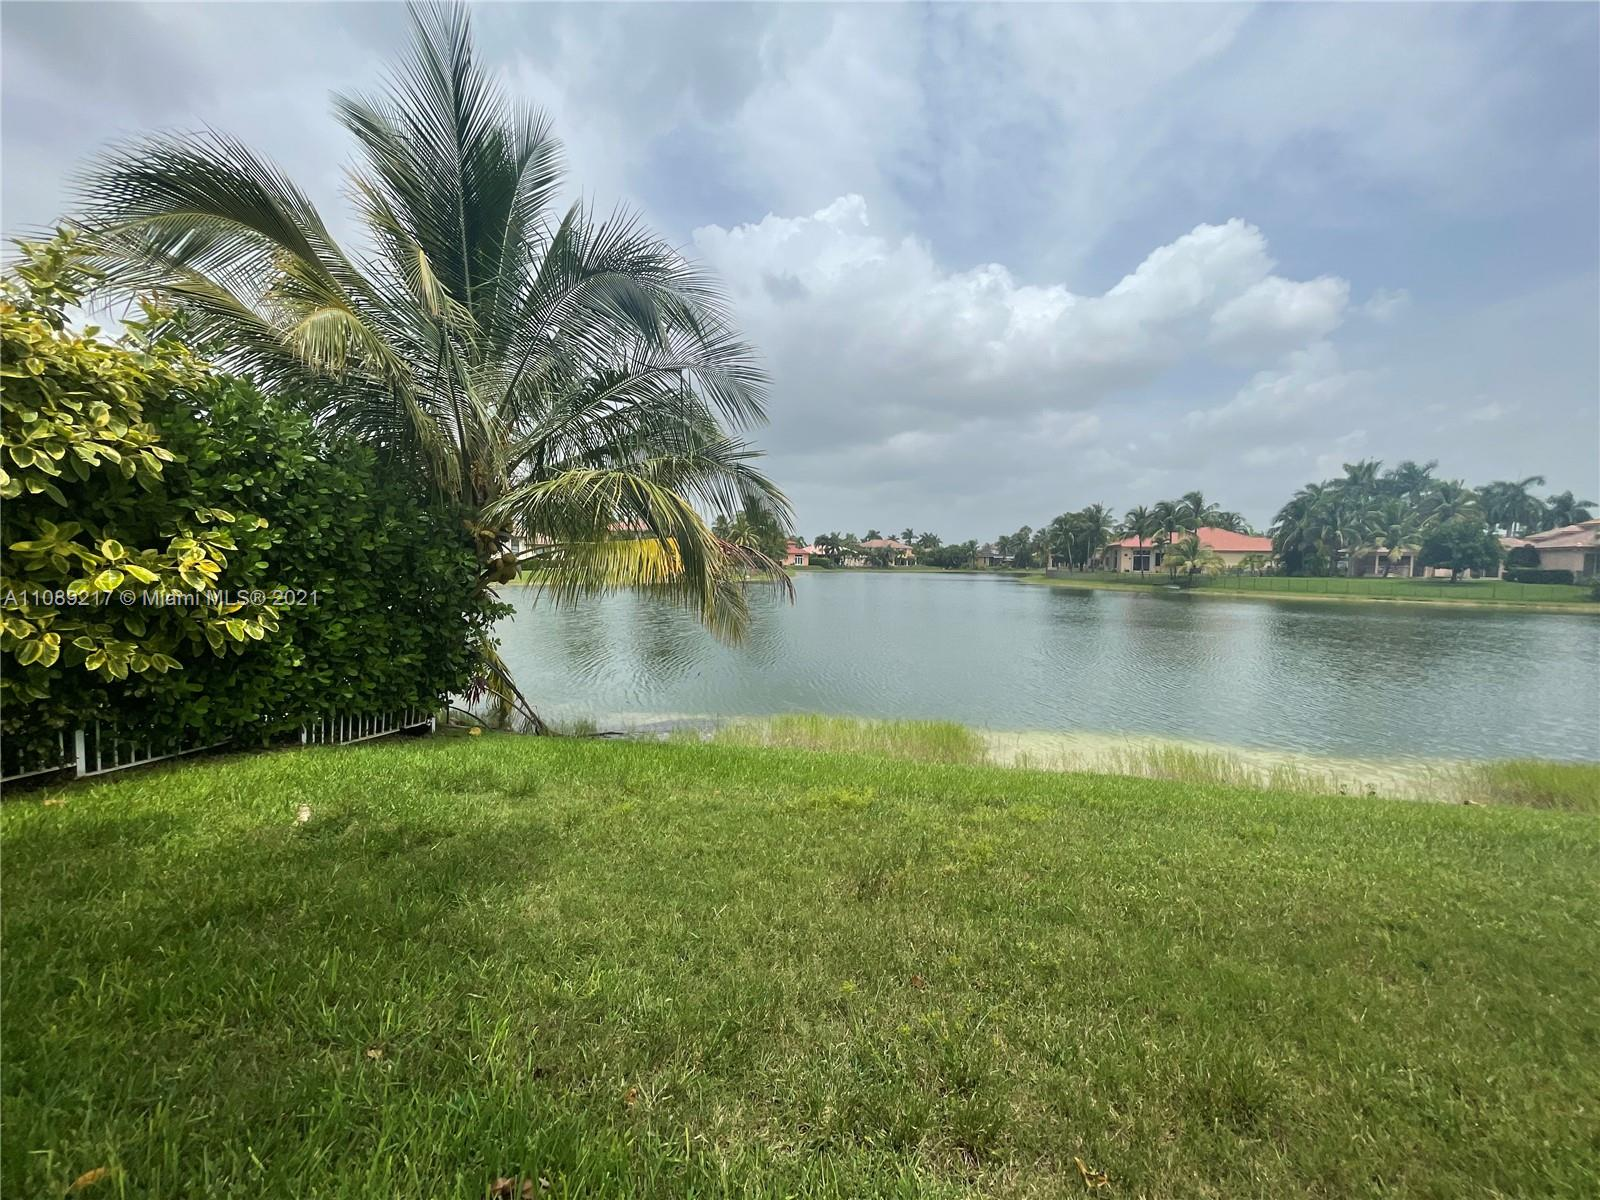 Sunset Lakes - 18571 SW 44th St, Miramar, FL 33029